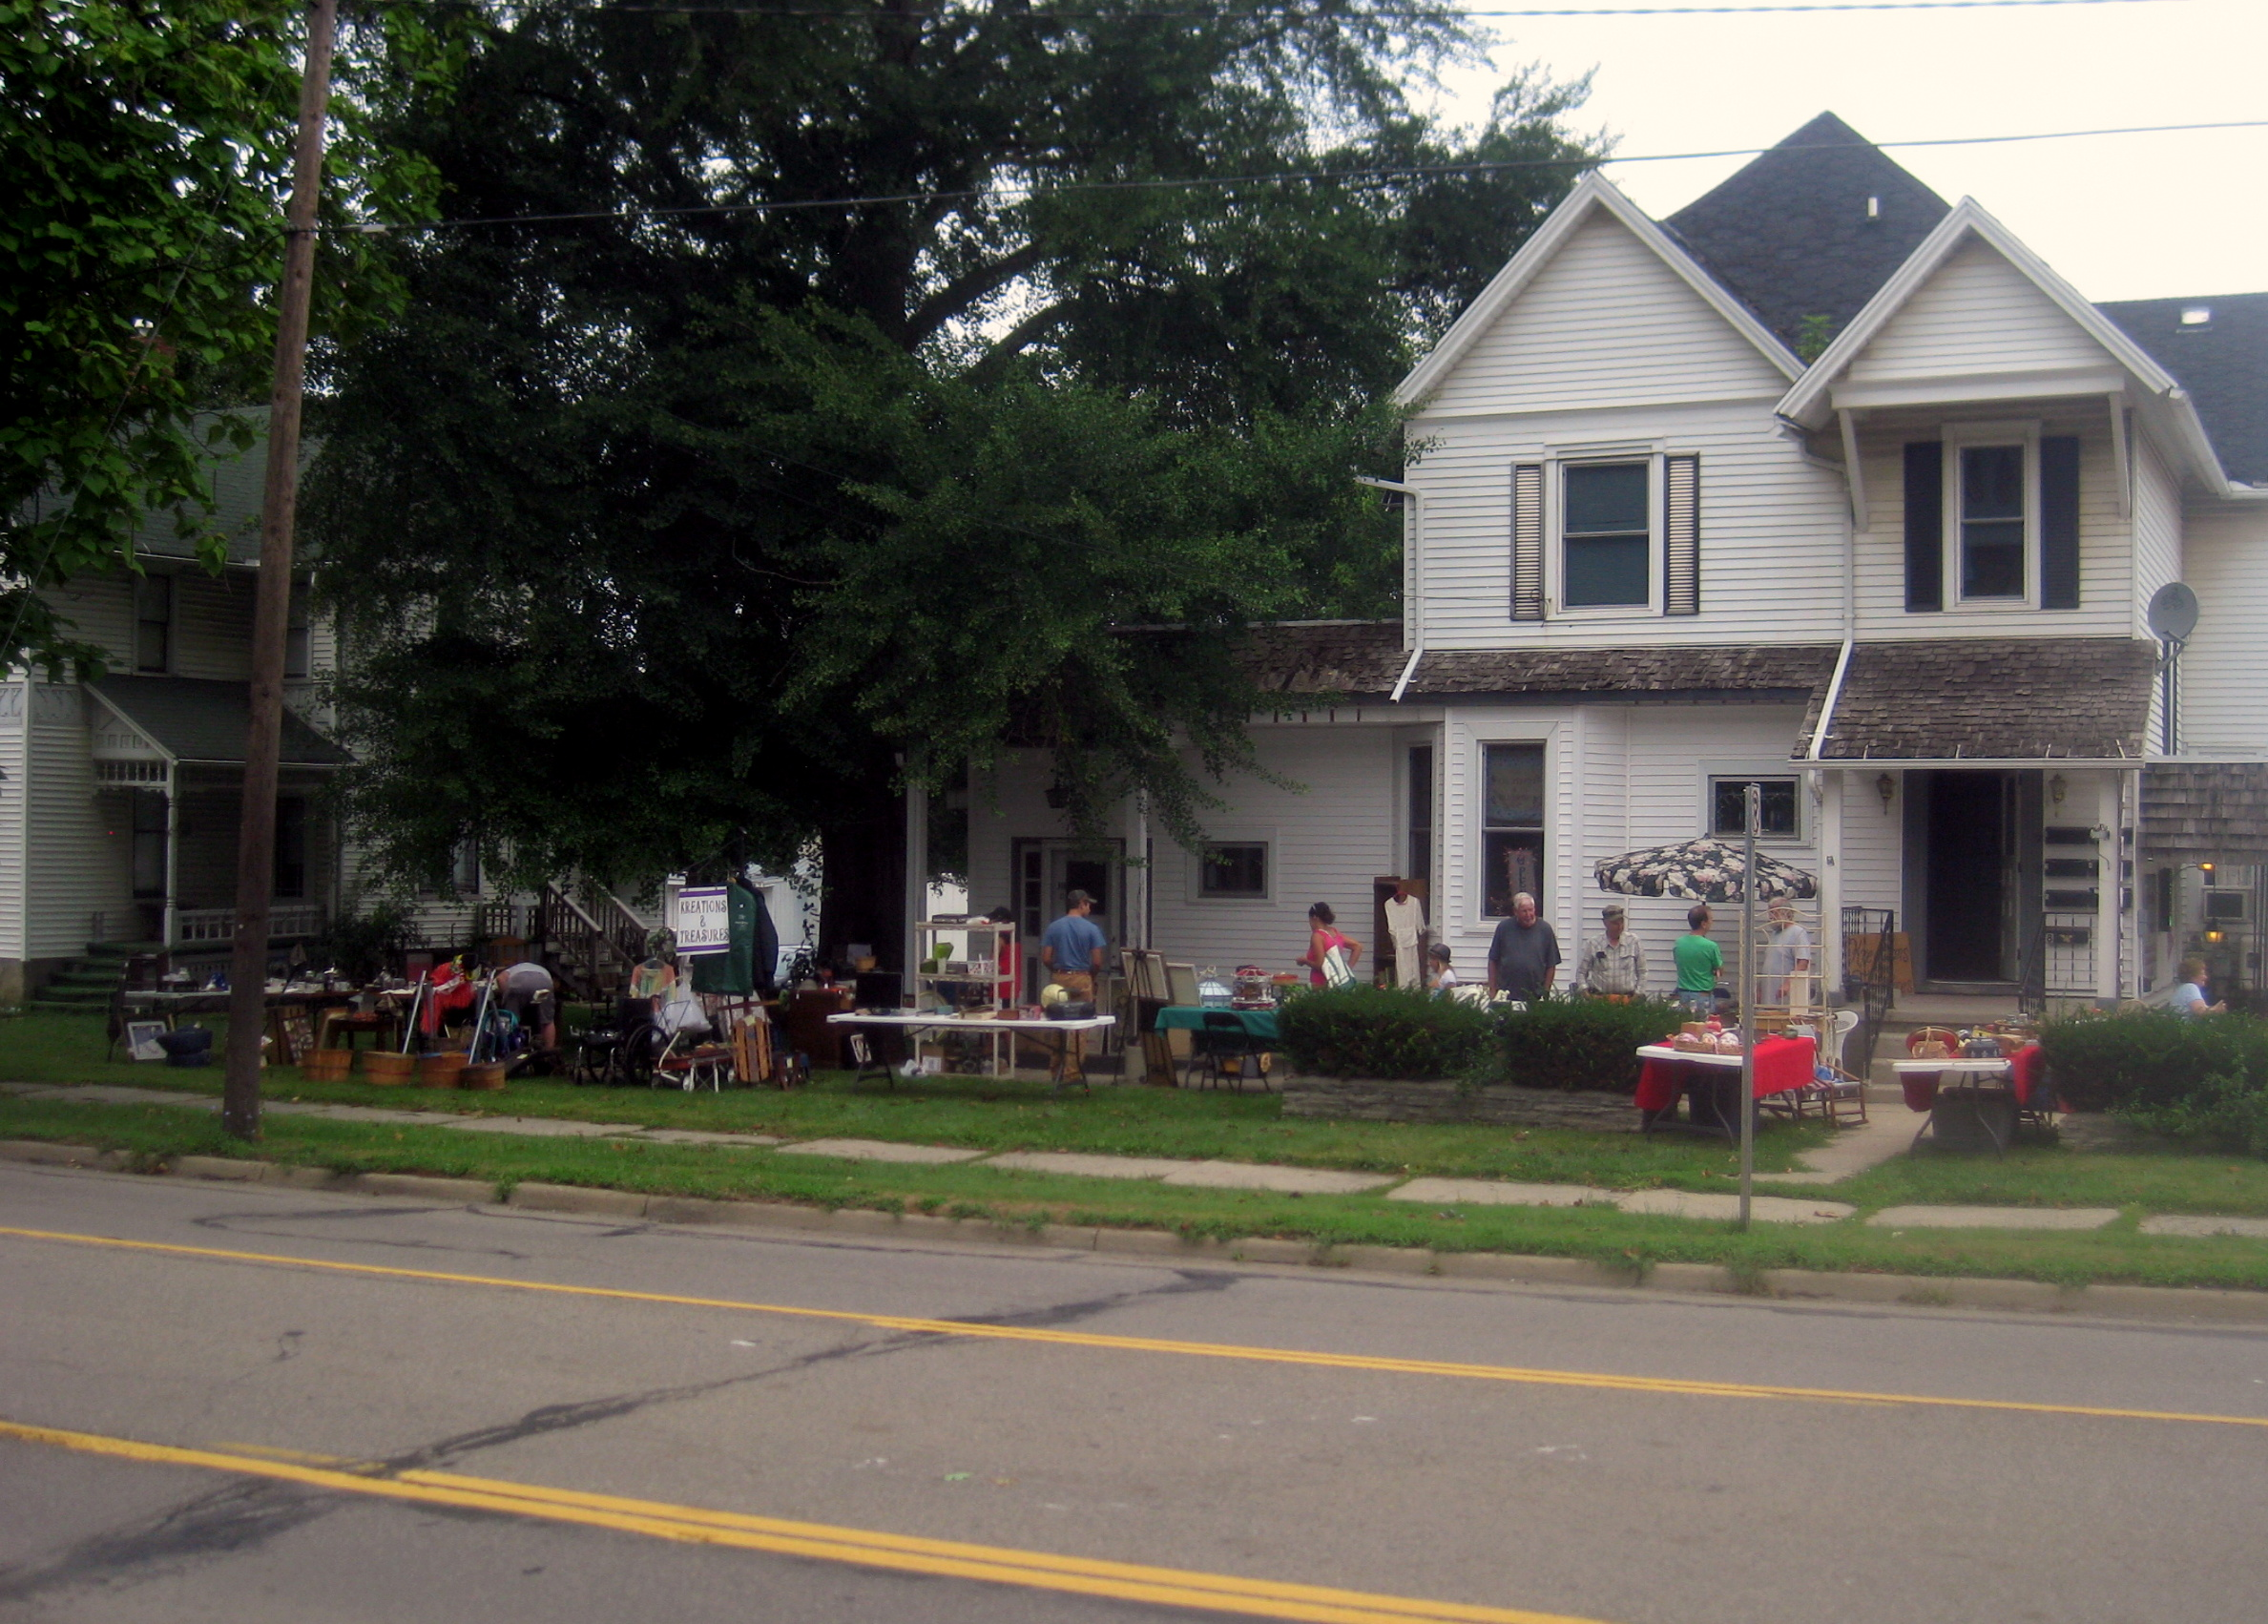 Michigan clinton county elsie - Stjohns 48879 Mintfestival